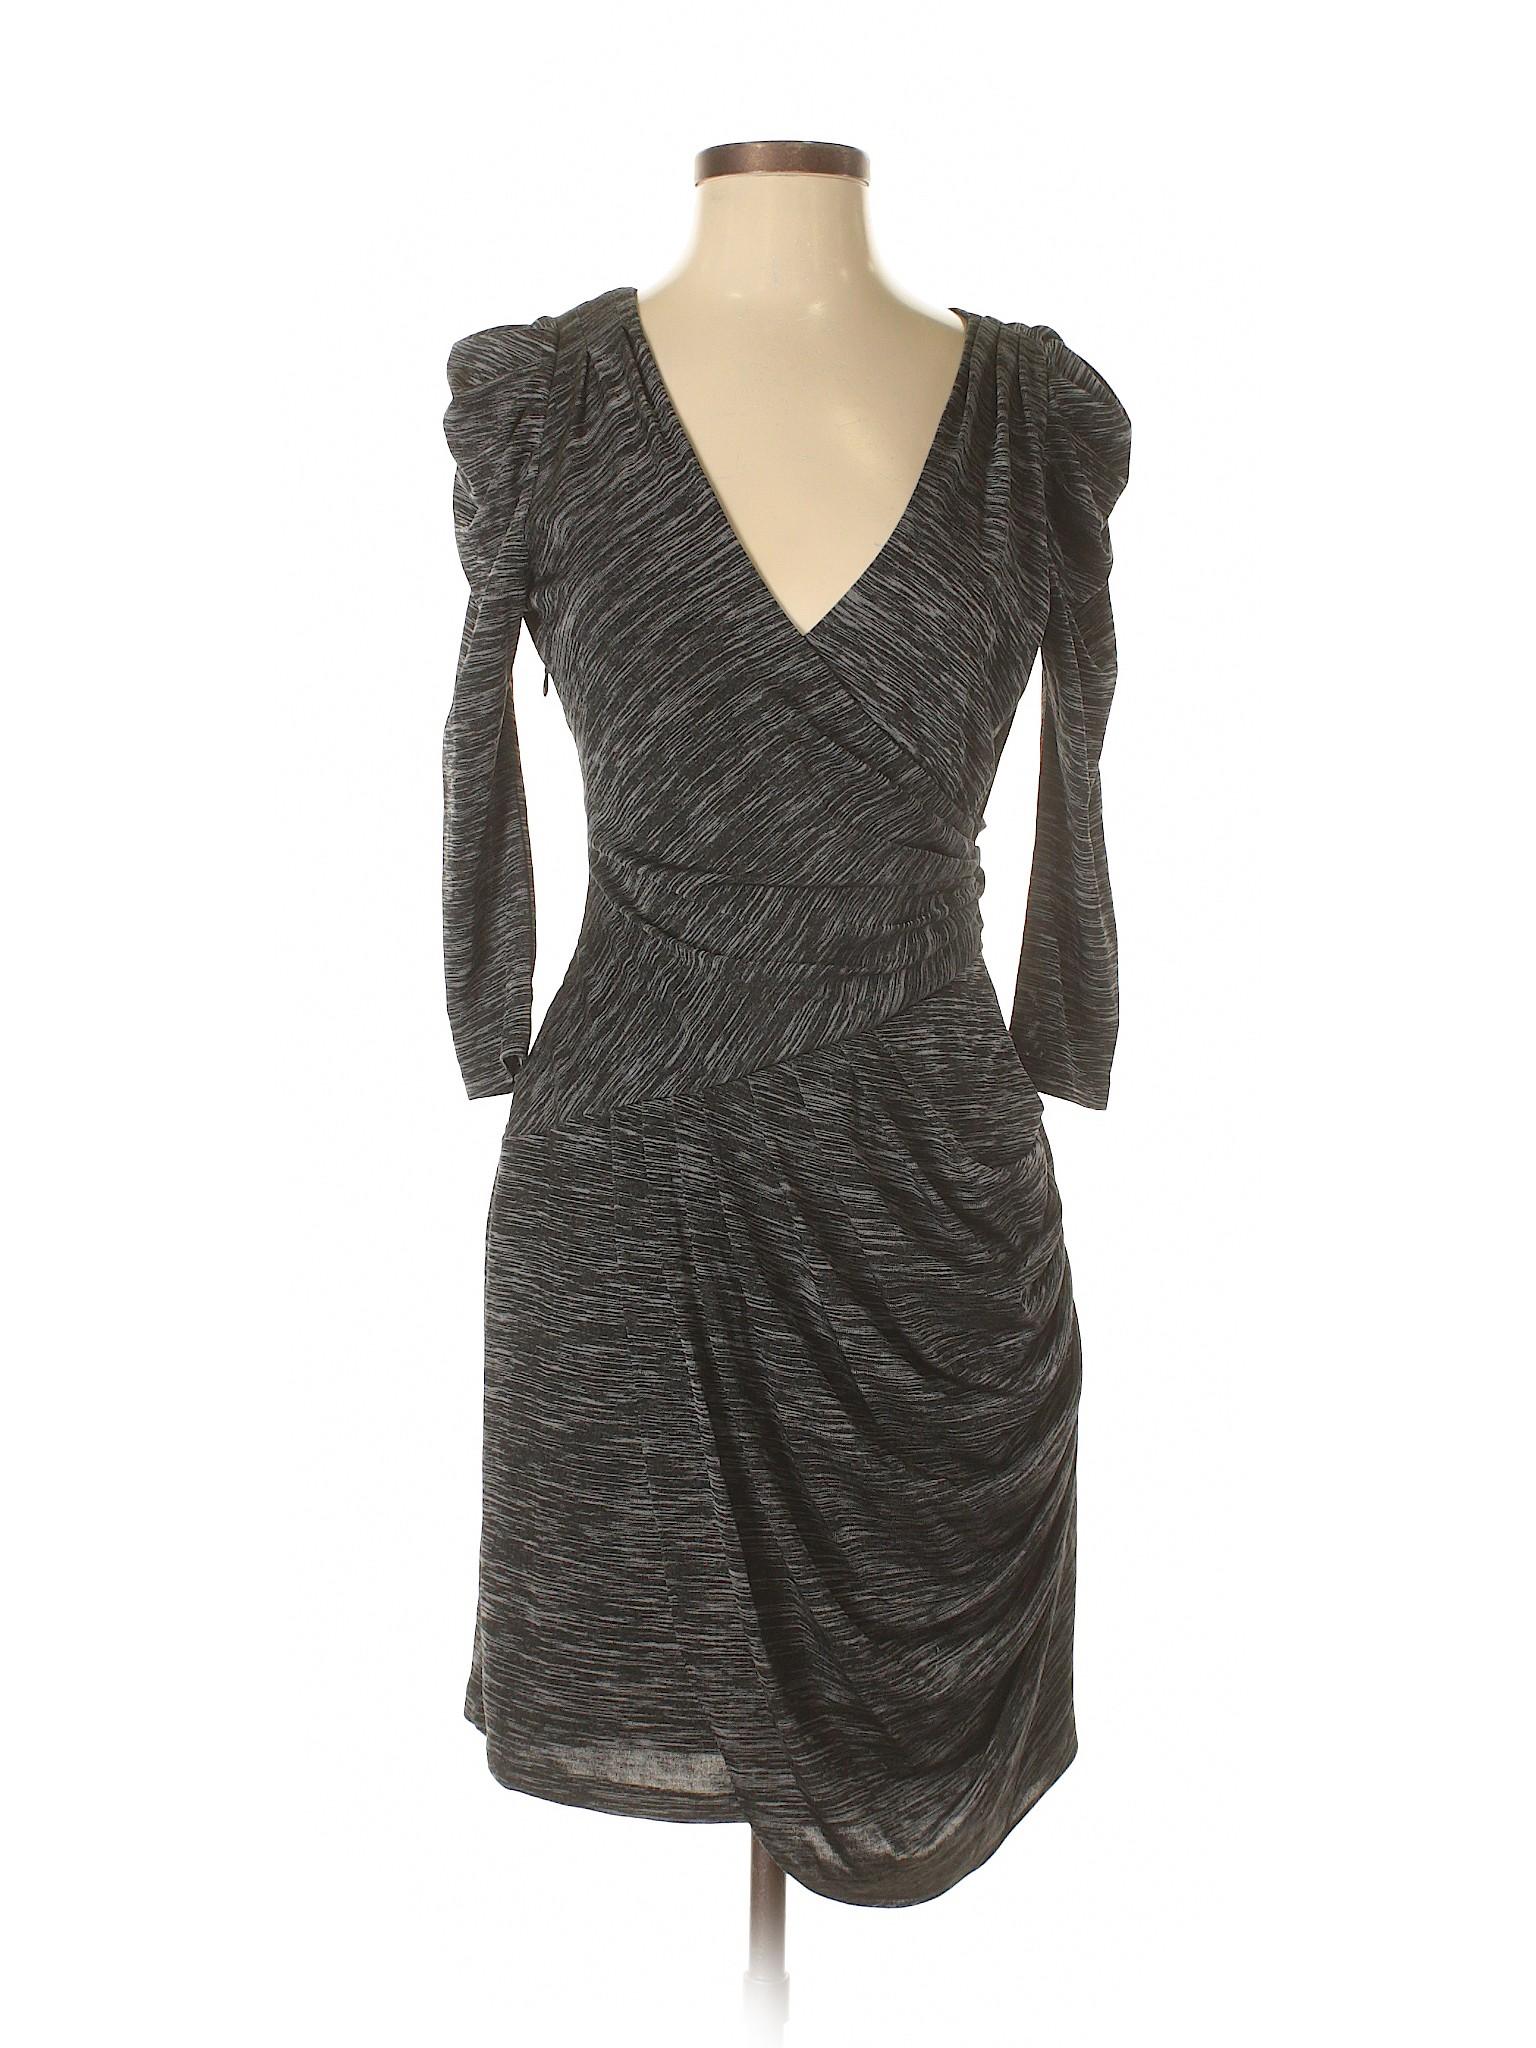 Selling Casual Cynthia Selling Cynthia Dress Steffe C6ZOxwnw7q